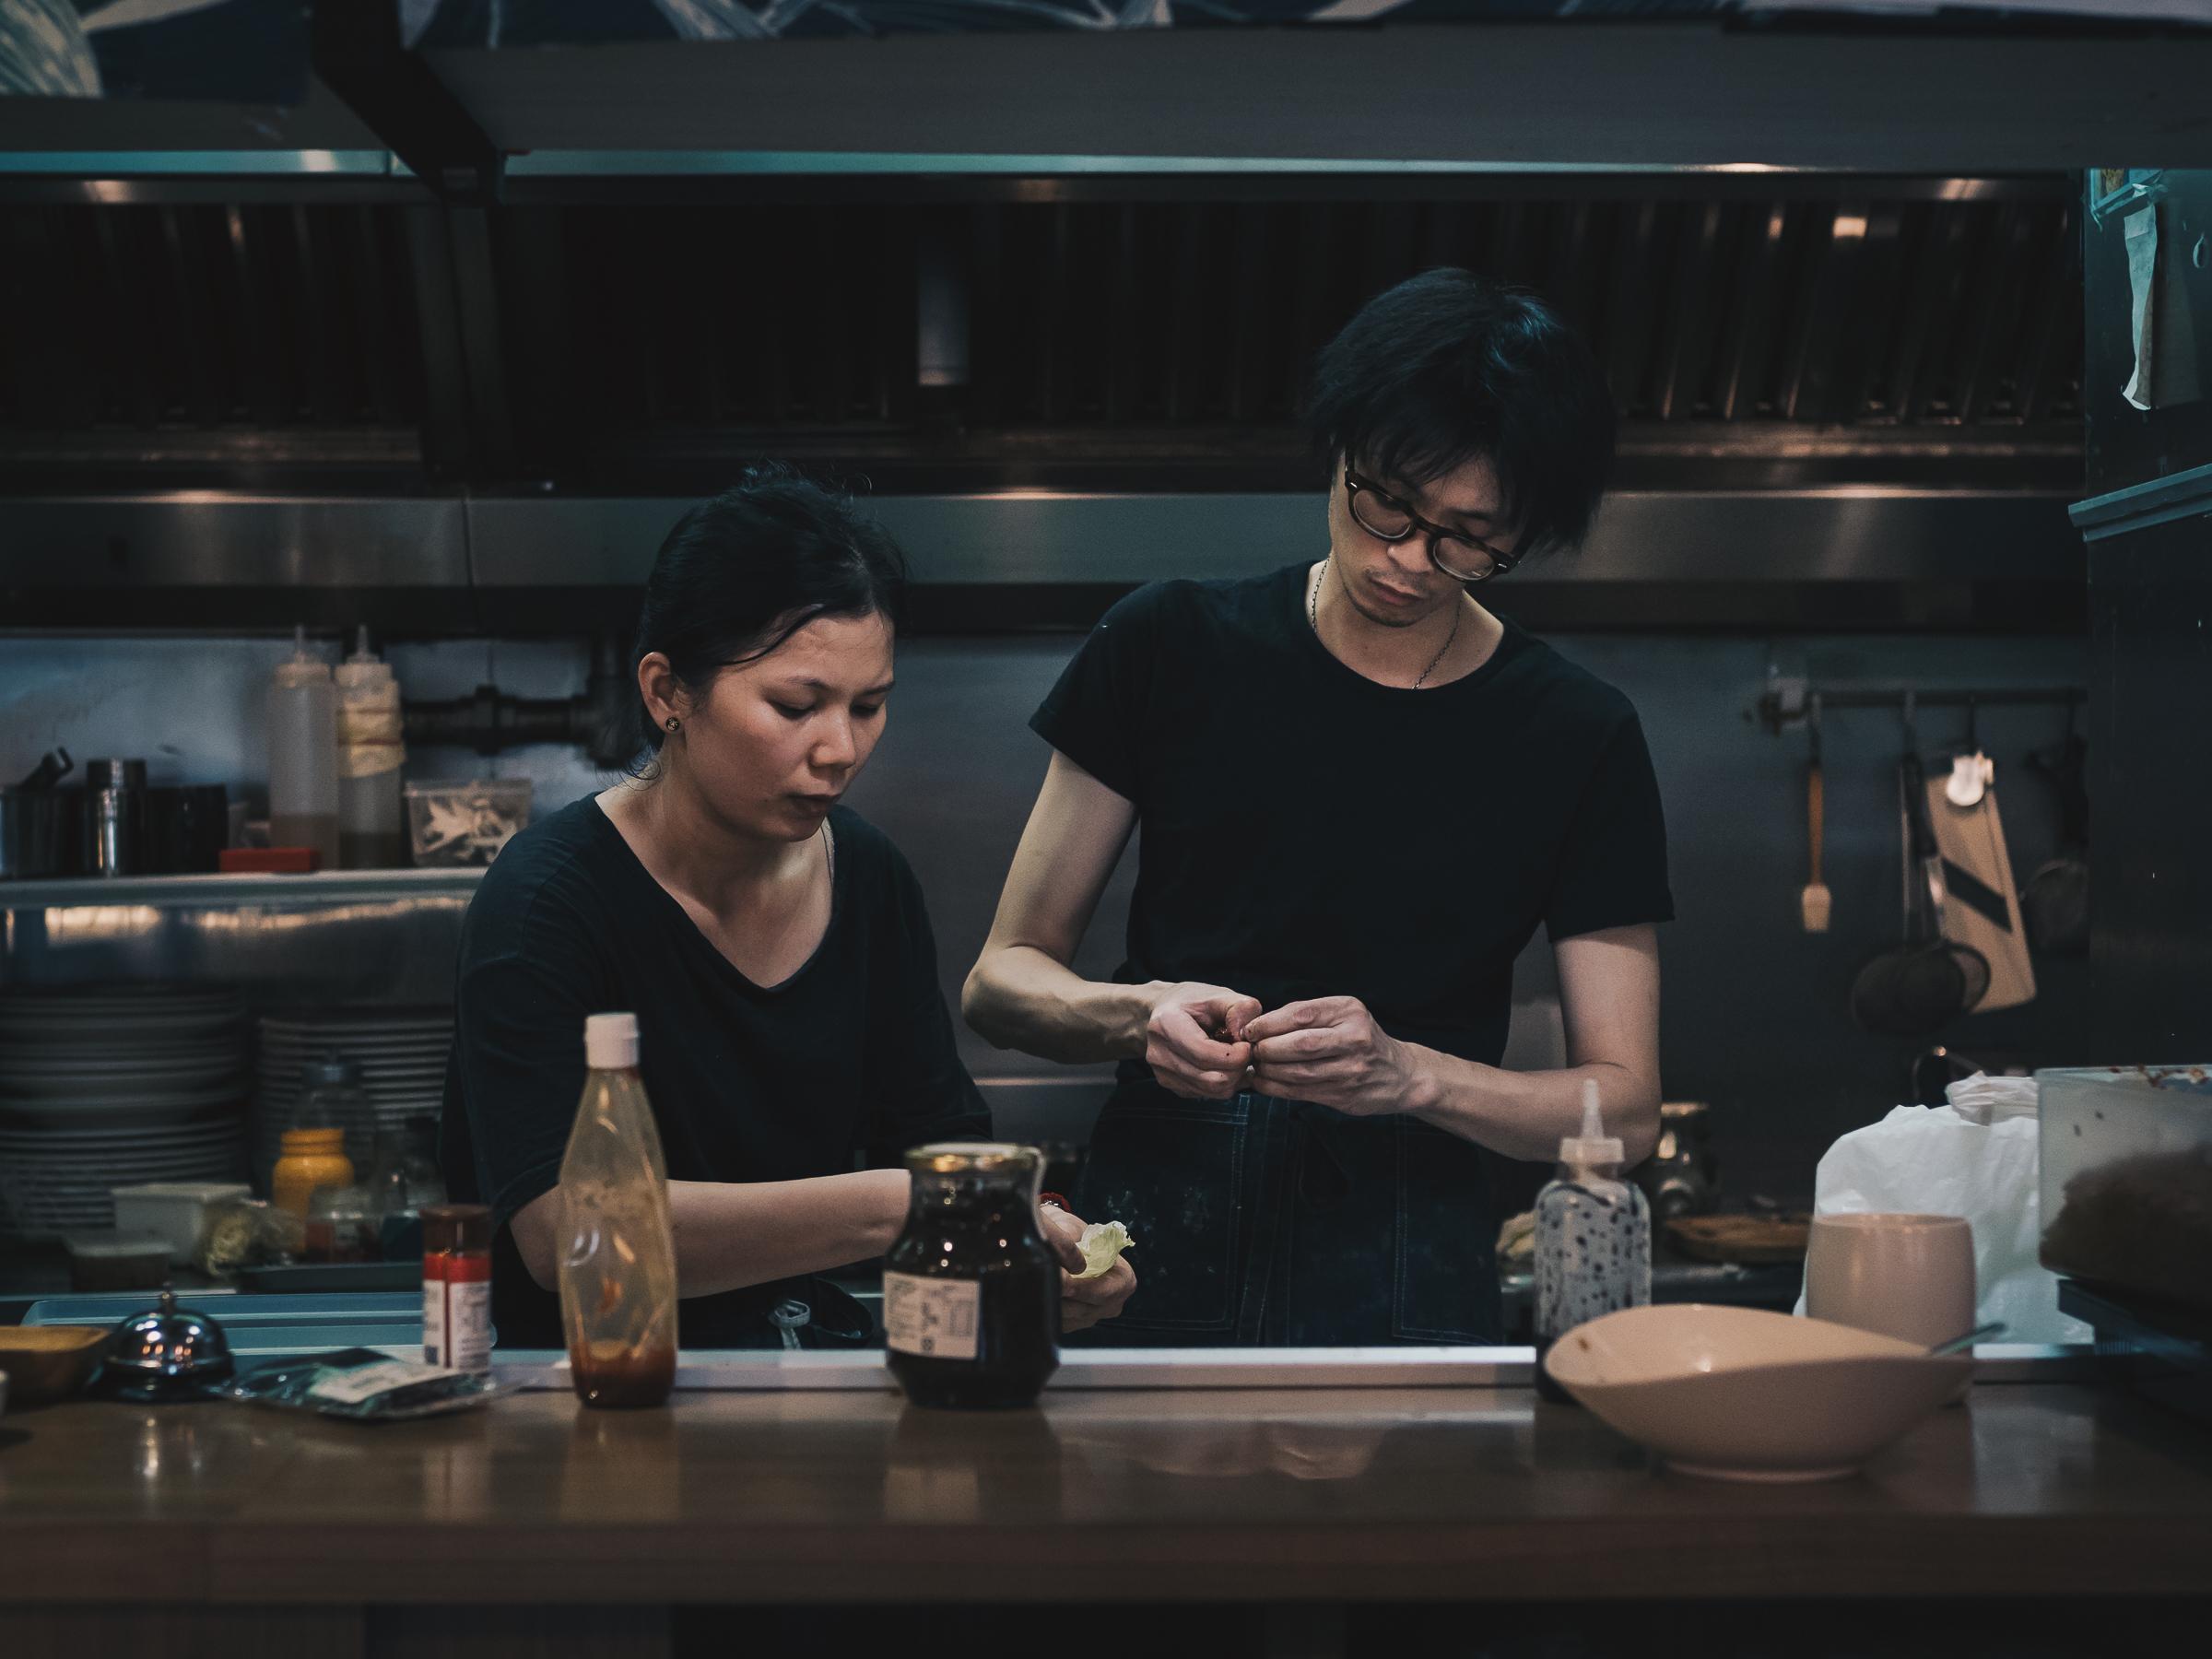 Miss Green Vegan Restaurant Taipei - 10-10 Hope - Olympus E-M1Markii 2512 - Yes! Please Enjoy-2.jpg